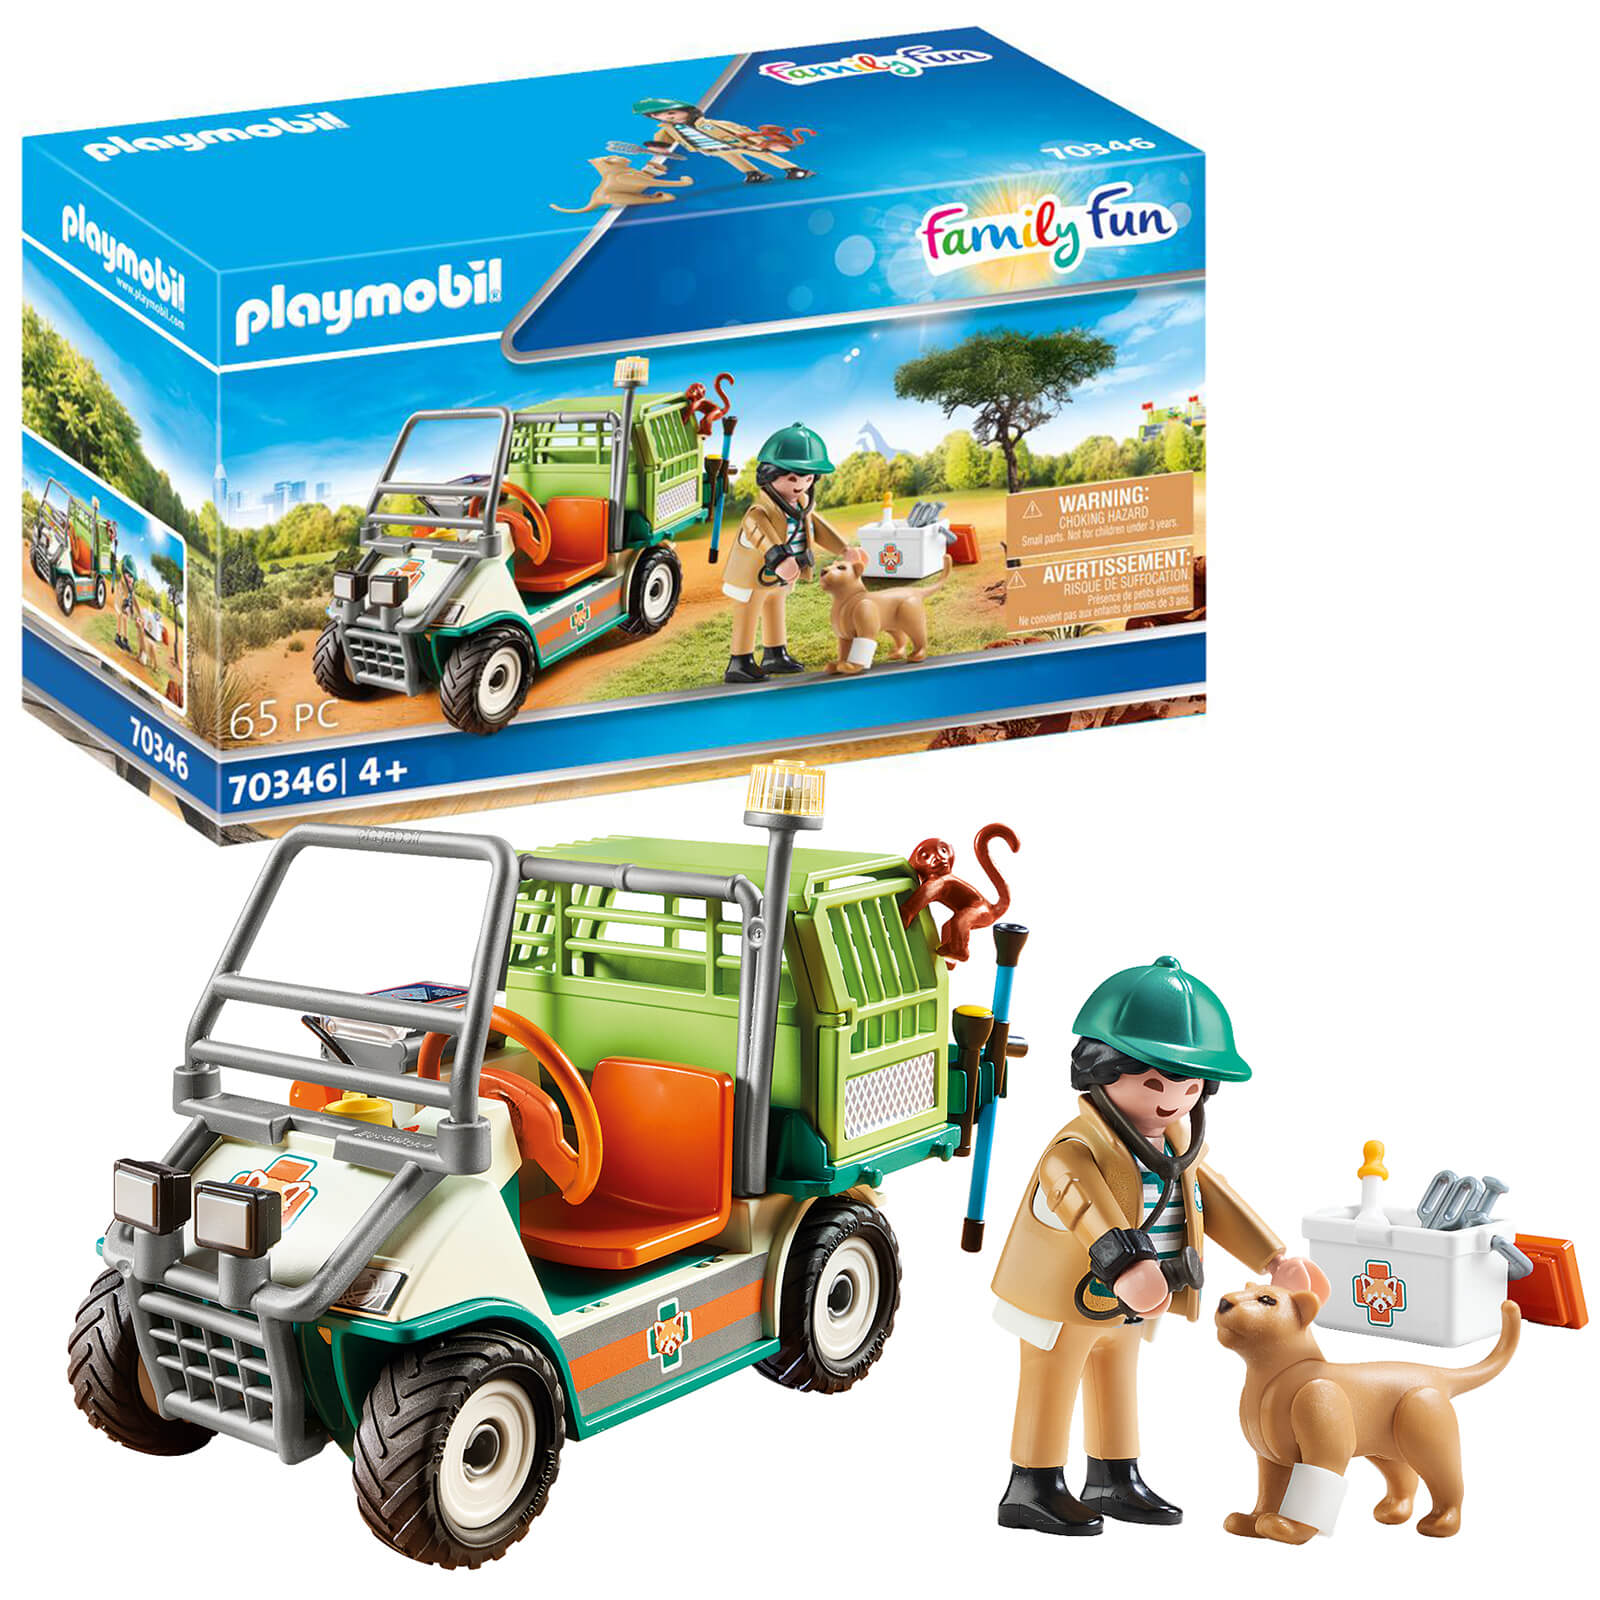 Playmobil Family Fun Zoo Vet With Medical Cart (70346)